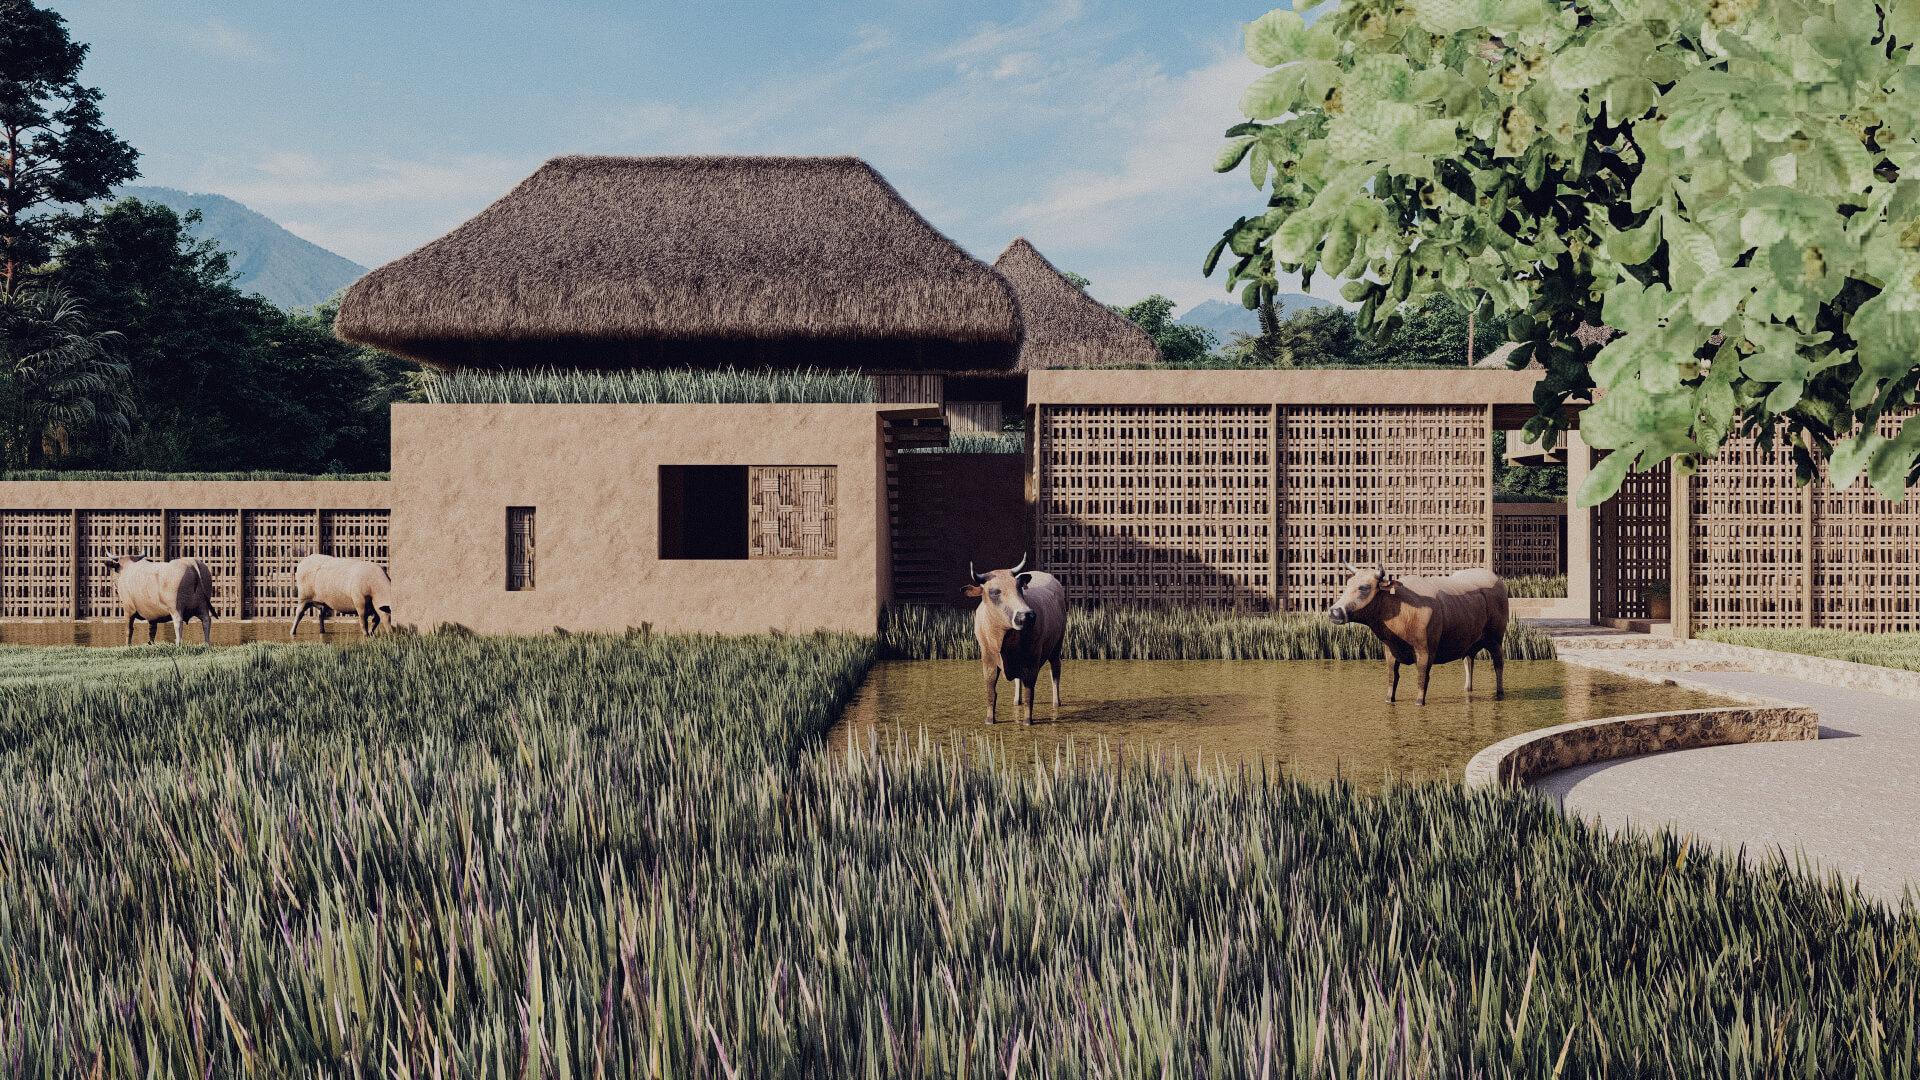 Rumah Besar Sembalun Lombok Architecture Approach